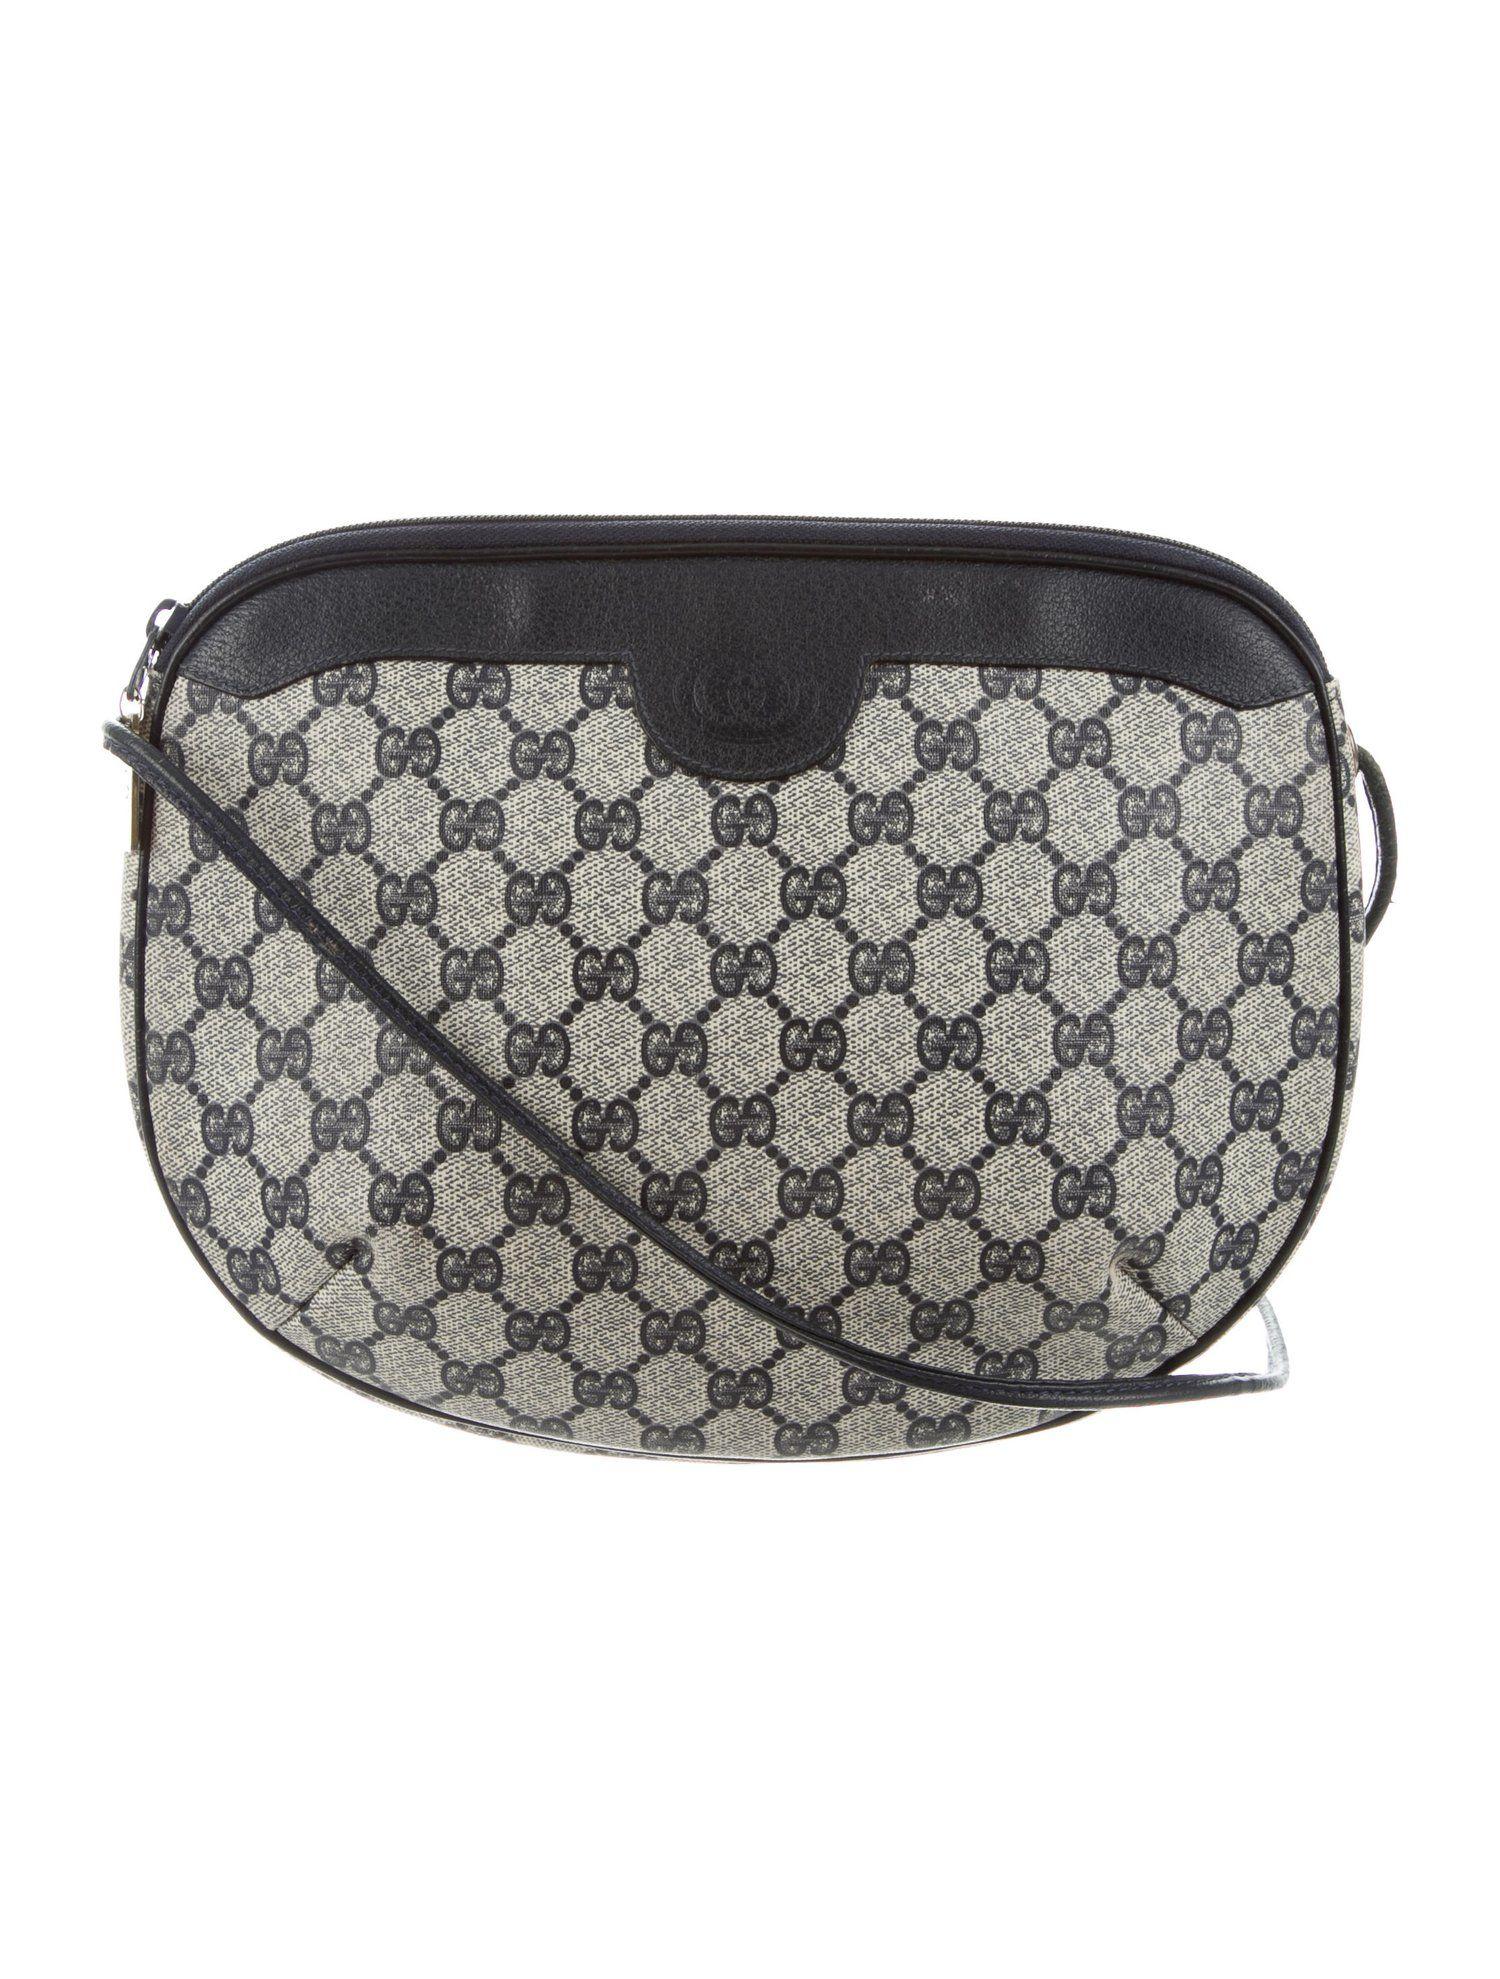 68fc6f4d8ed91 Vintage GG Plus Crossbody Bag | Bag Lady | Gucci crossbody bag ...